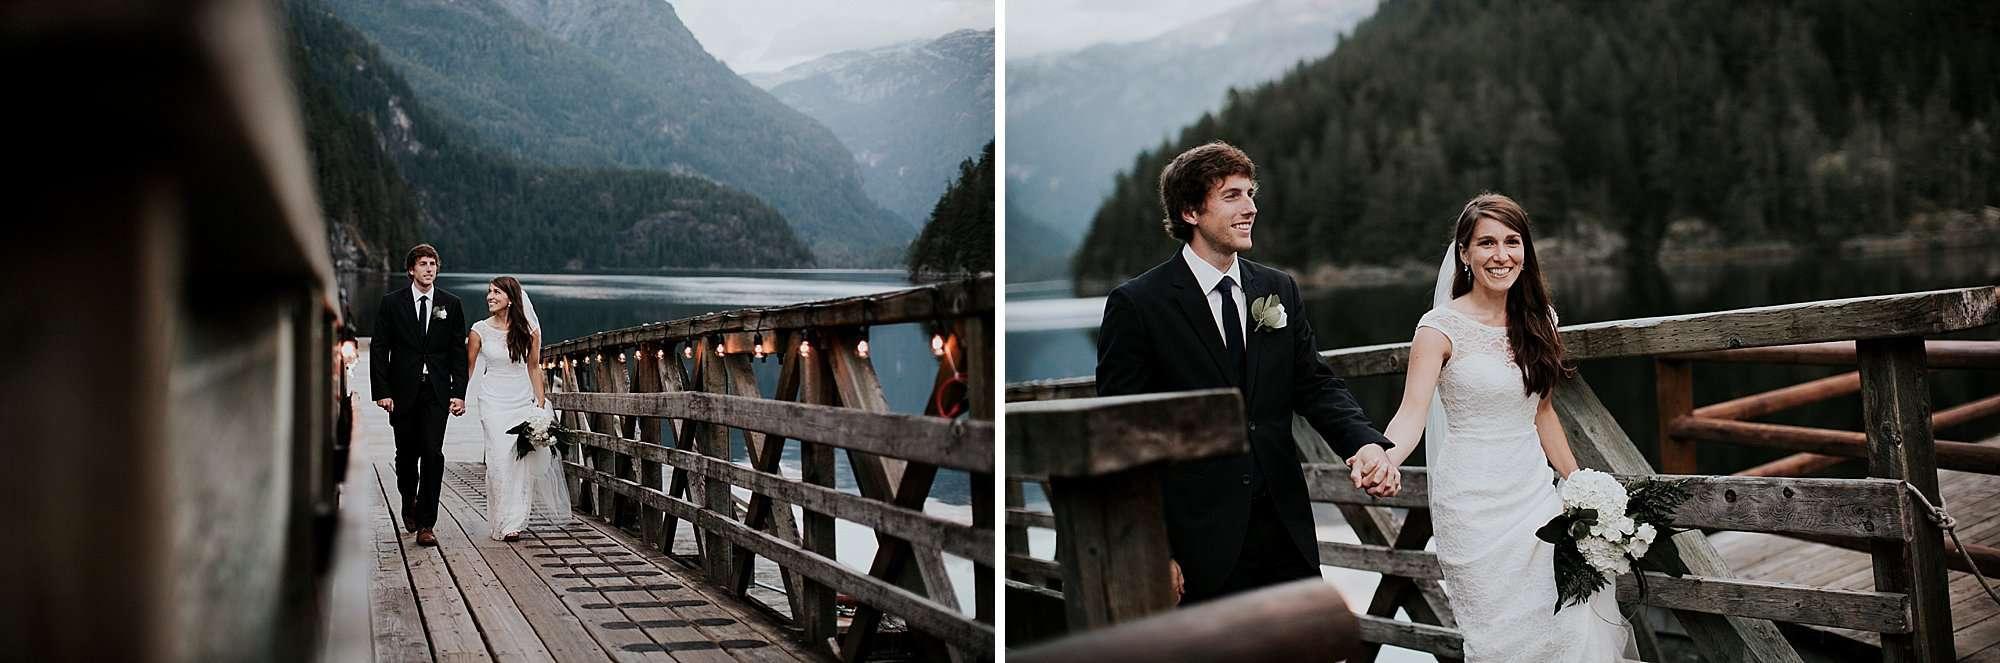 malibu-british-columbia-canada-pacific-northwest-wedding-0054